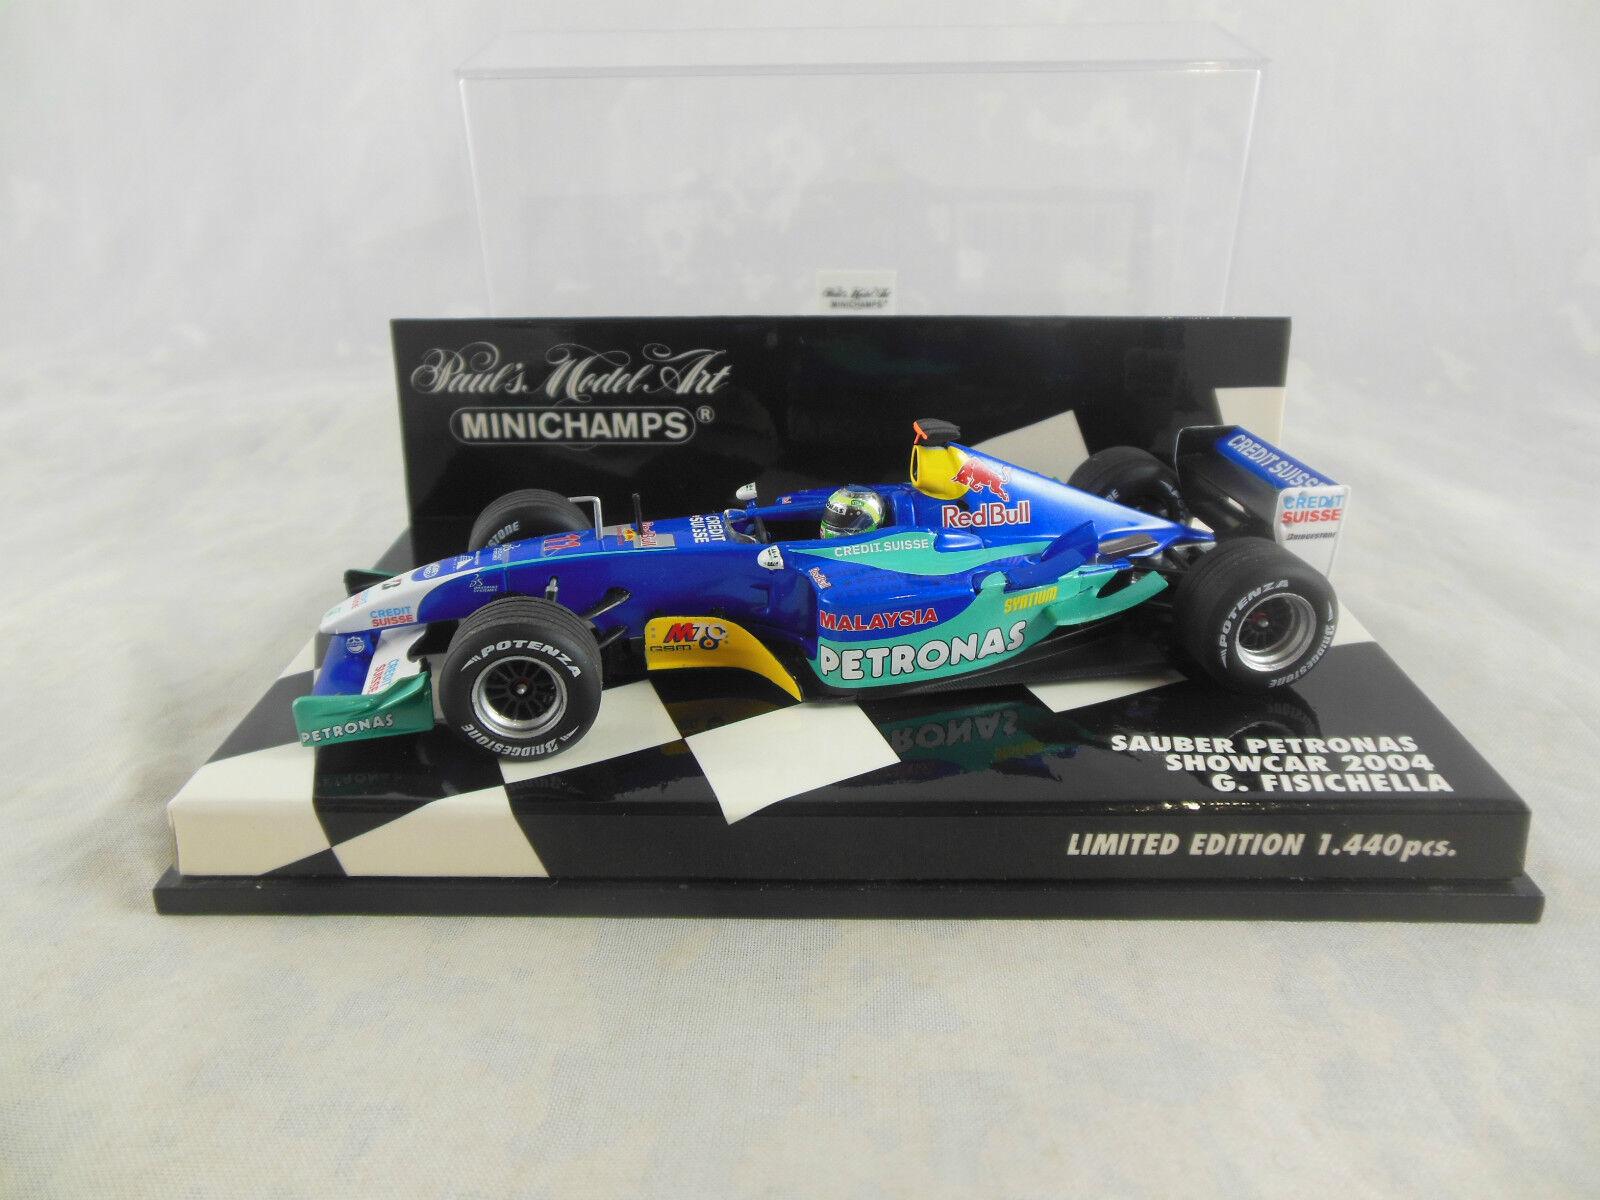 Minichamps 400 040081 Sauber Petronas ShowCoche 2004 G Prix Racing Nº 11